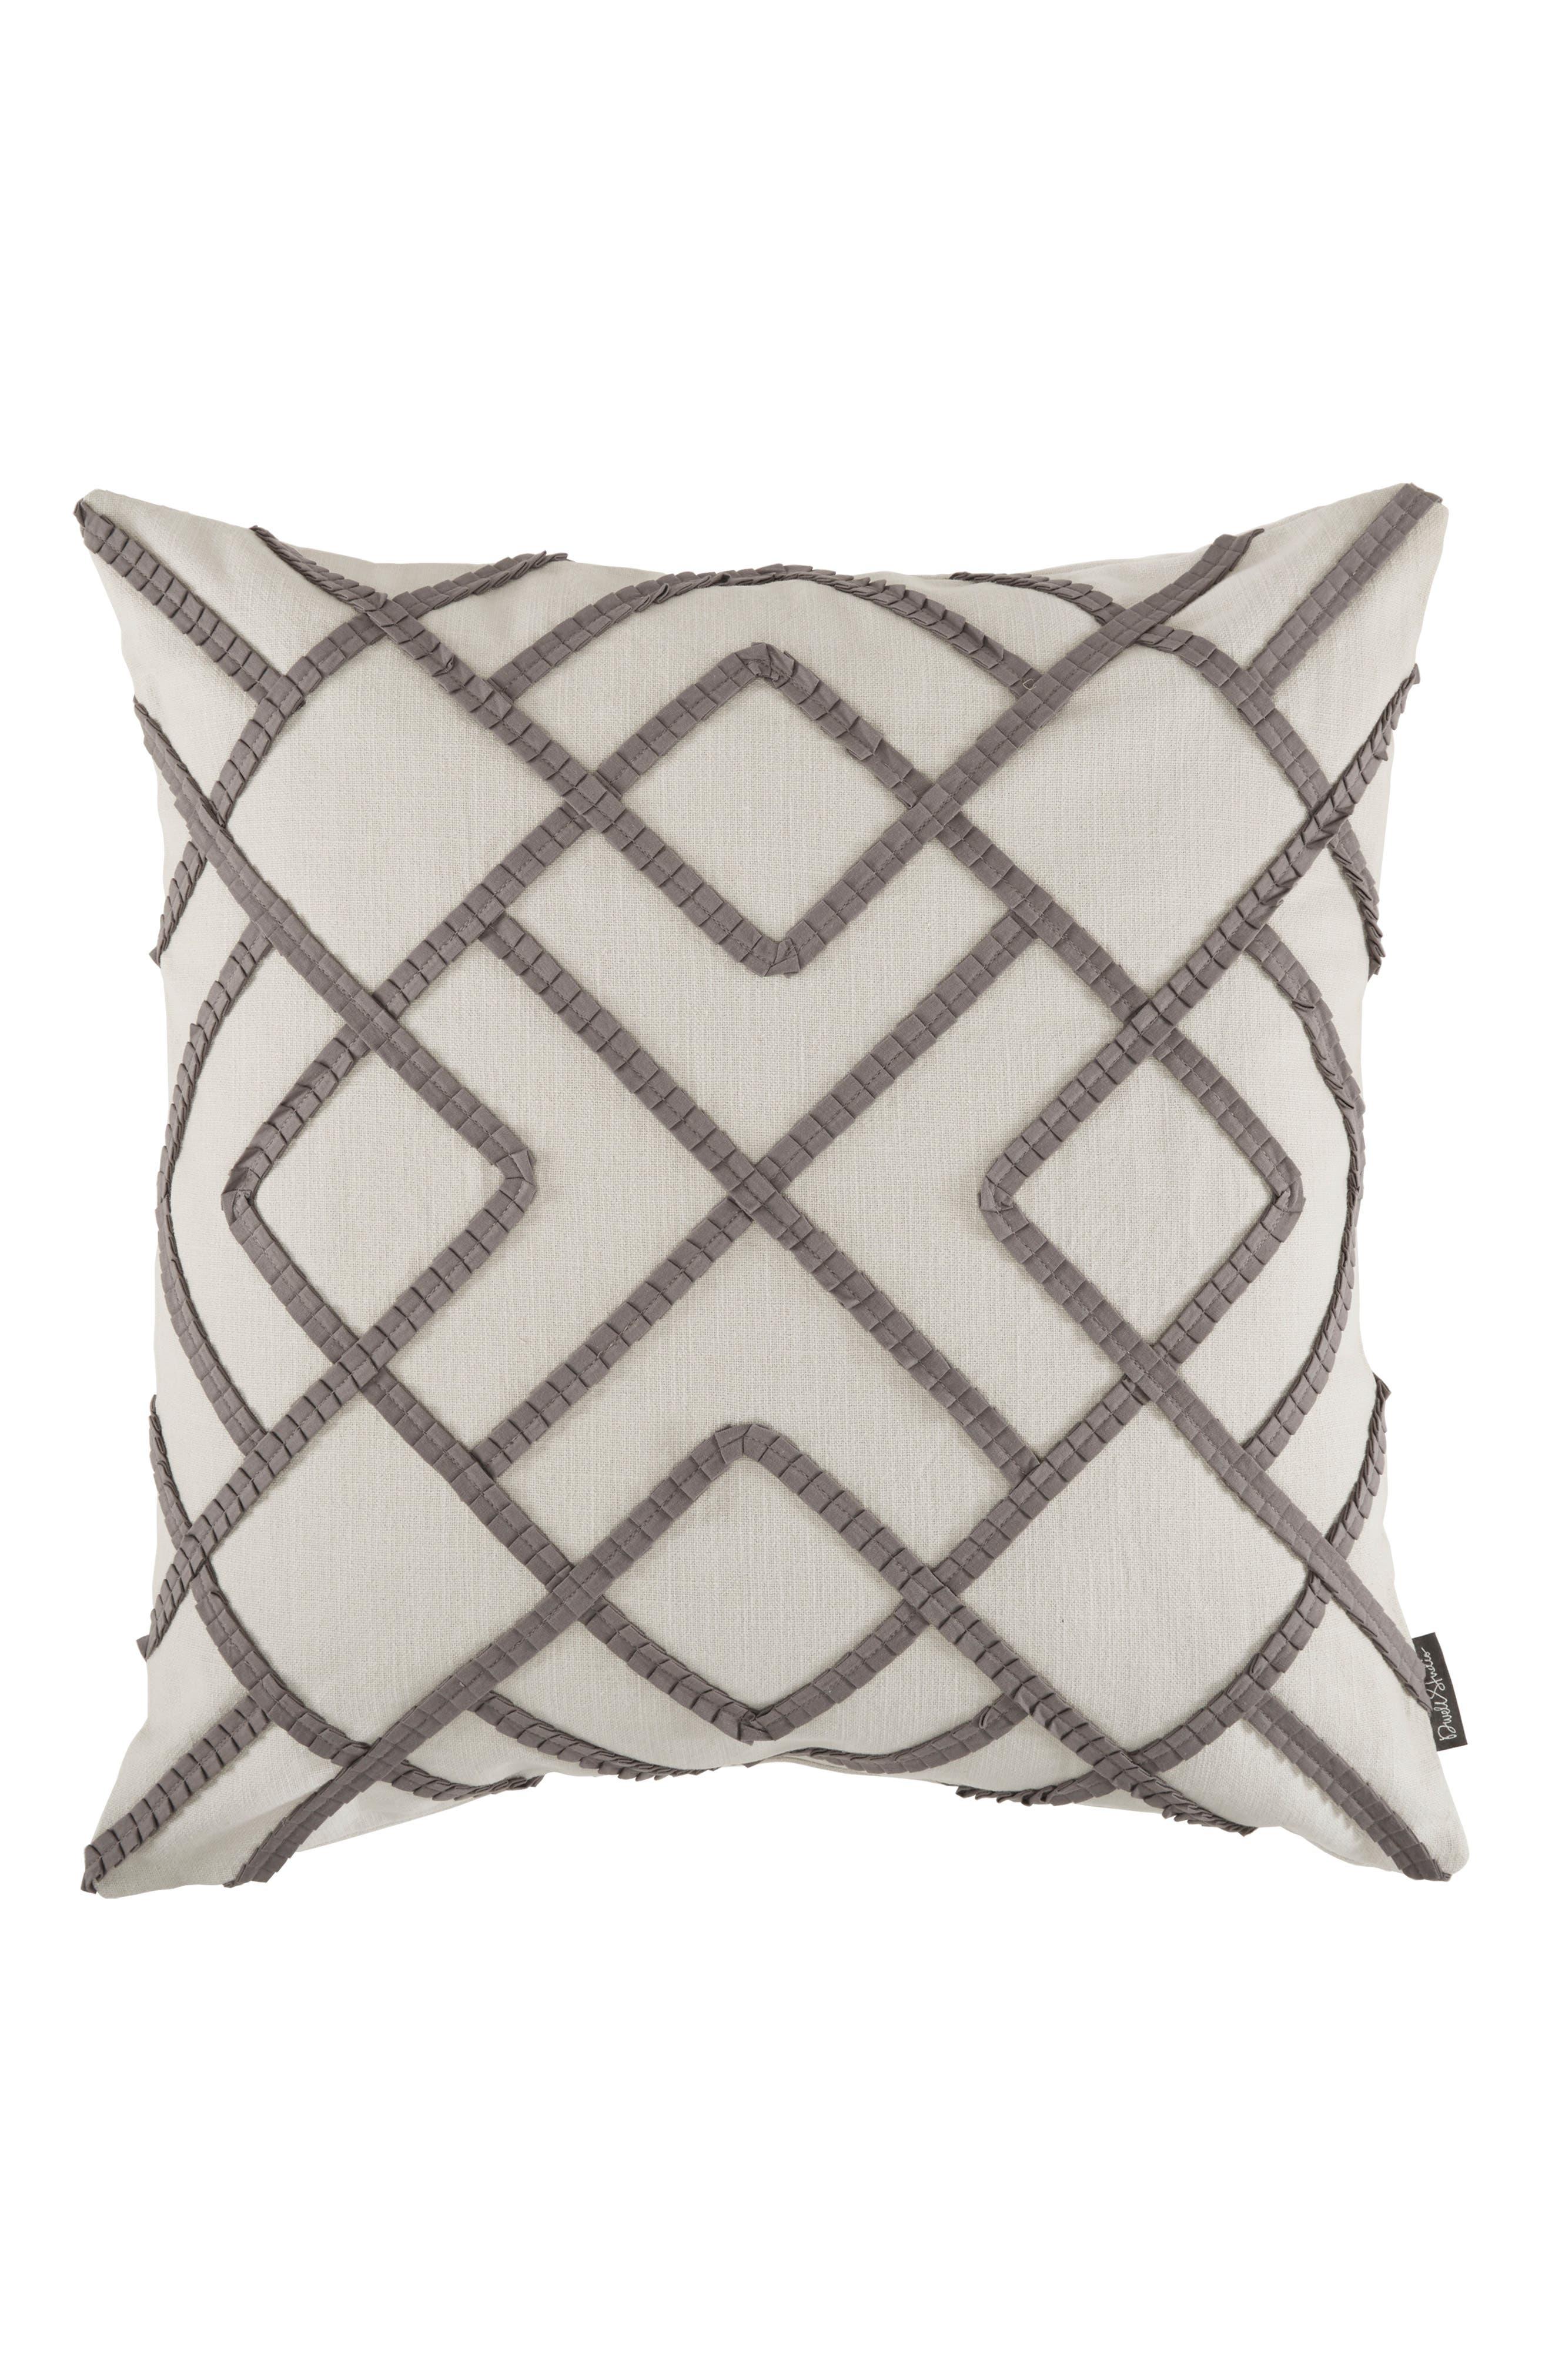 Main Image - DwellStudio Windsor Accent Pillow